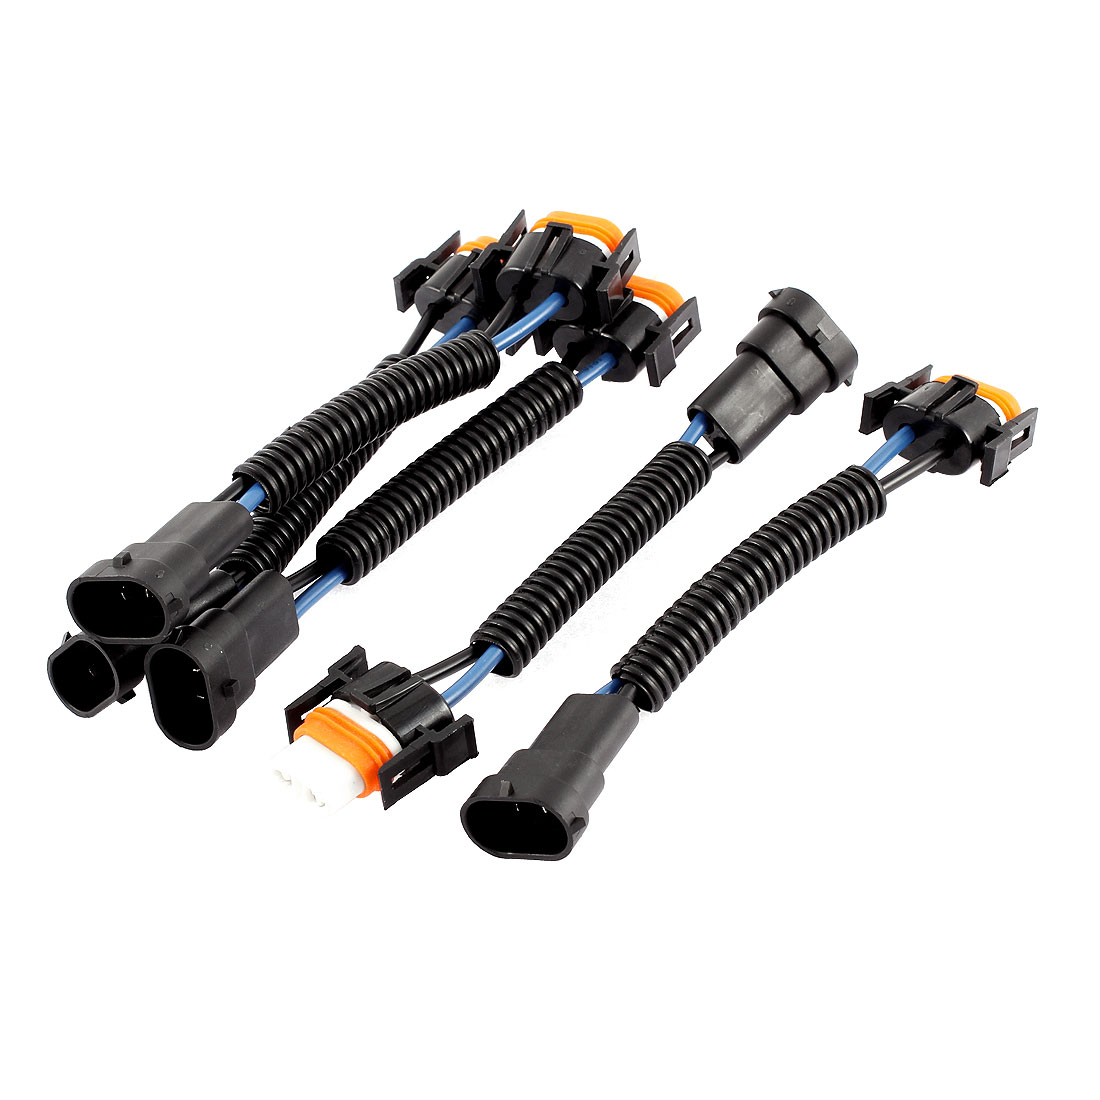 Unique Bargains Car Headlight H11 Male Female Socket Harness Wiring Wire Plastic Connector Plug 5 Pcs